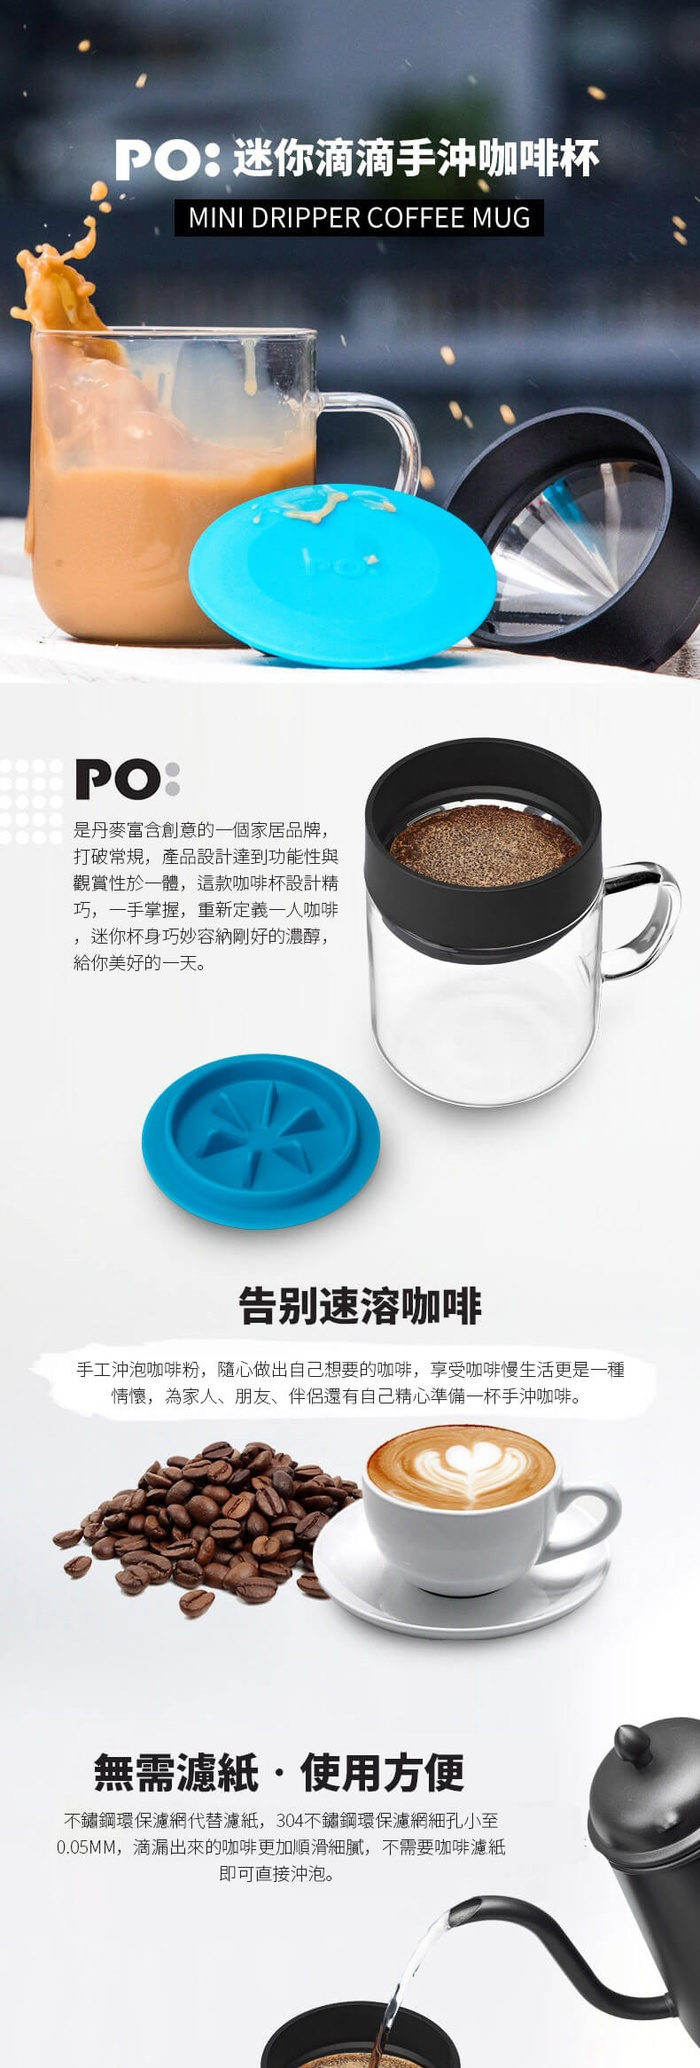 PO:Selected|丹麥研磨過濾咖啡玻璃杯240ml (藍)